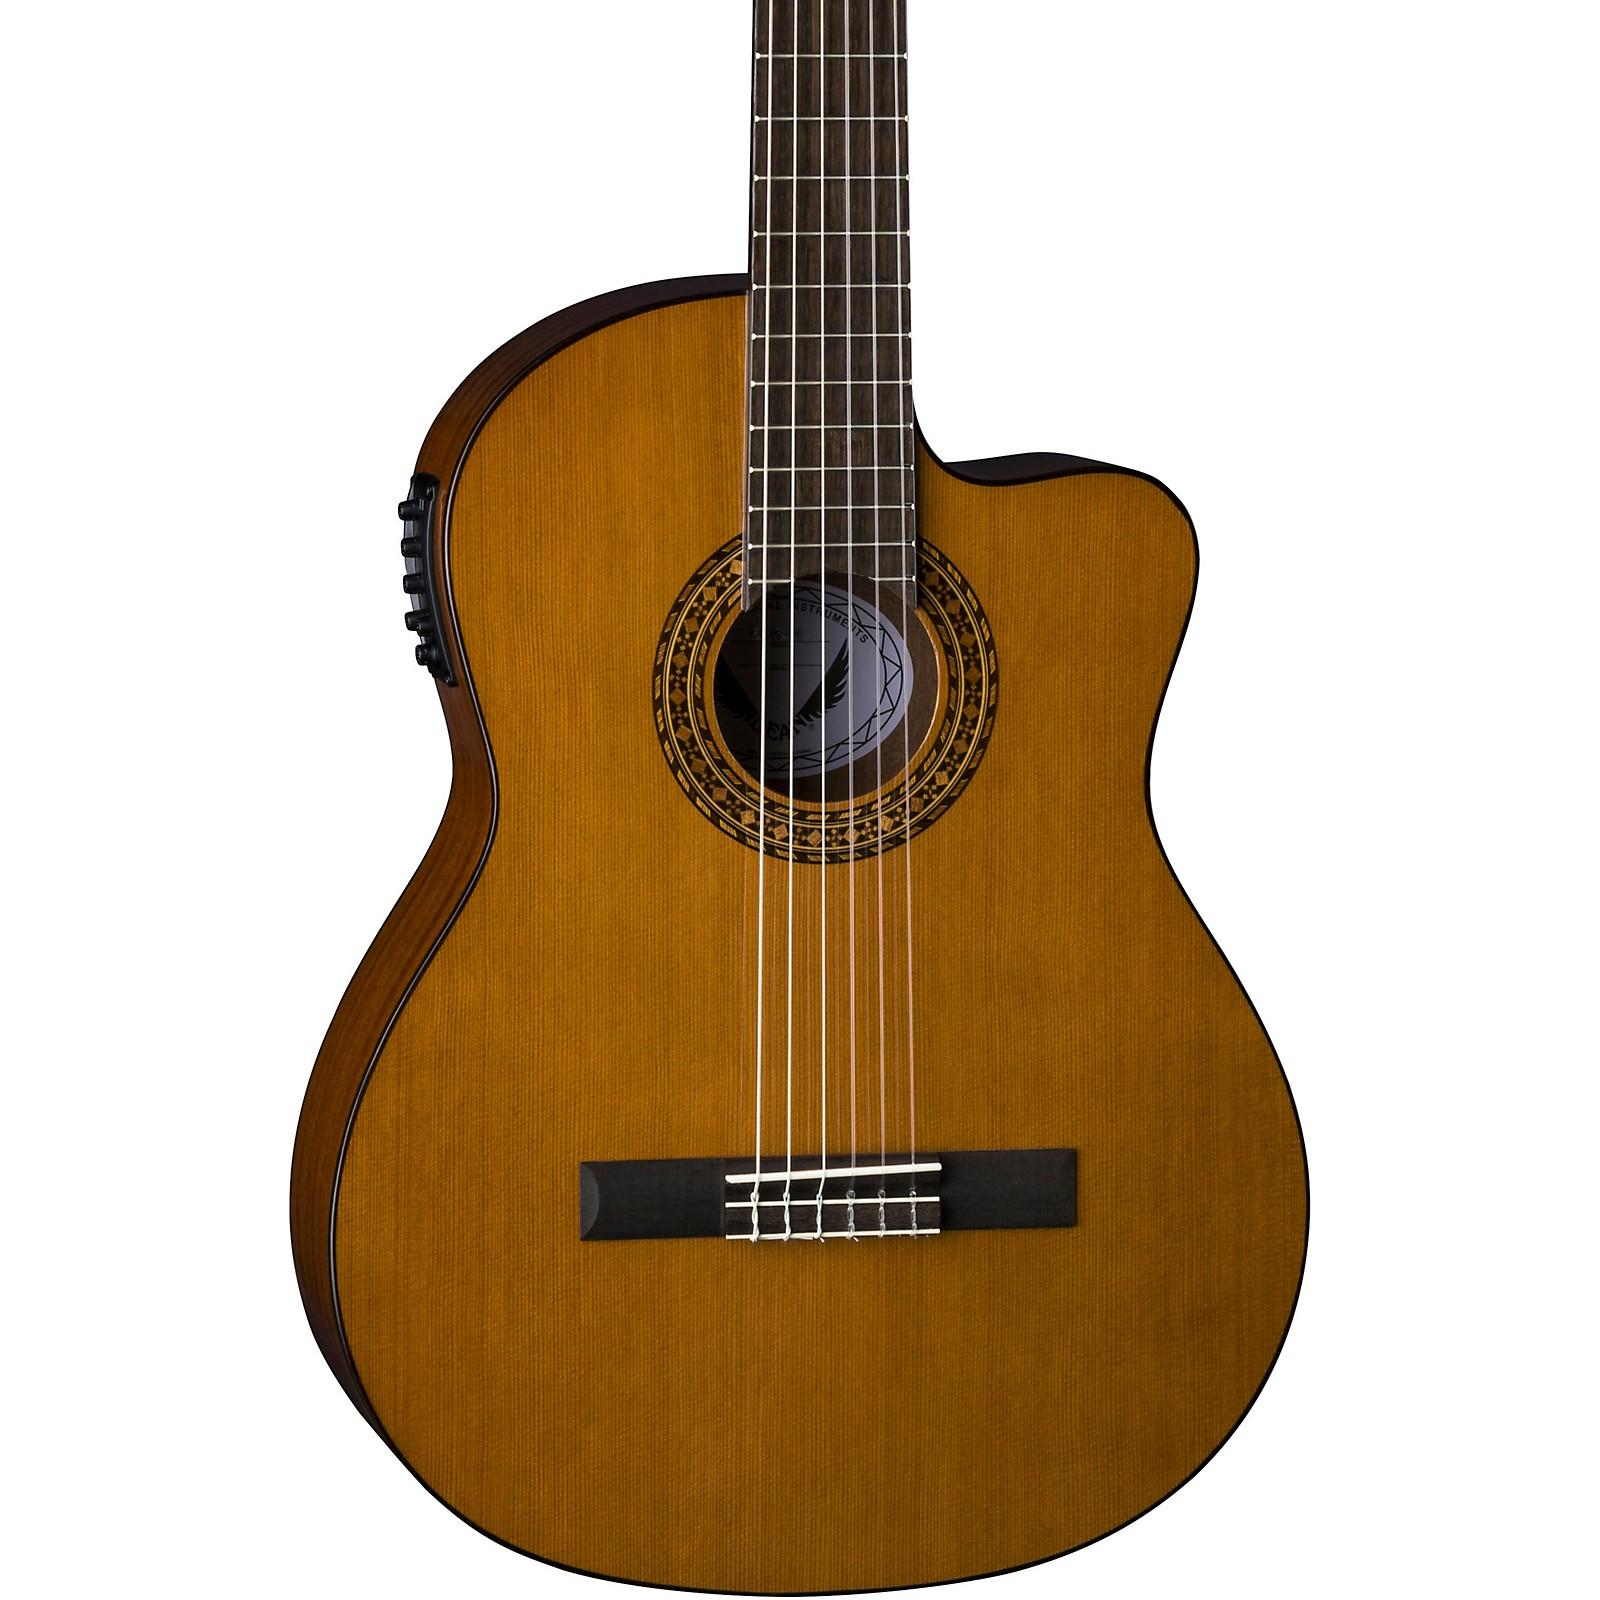 Dean Espana Classical Plus Acoustic-Electric Guitar